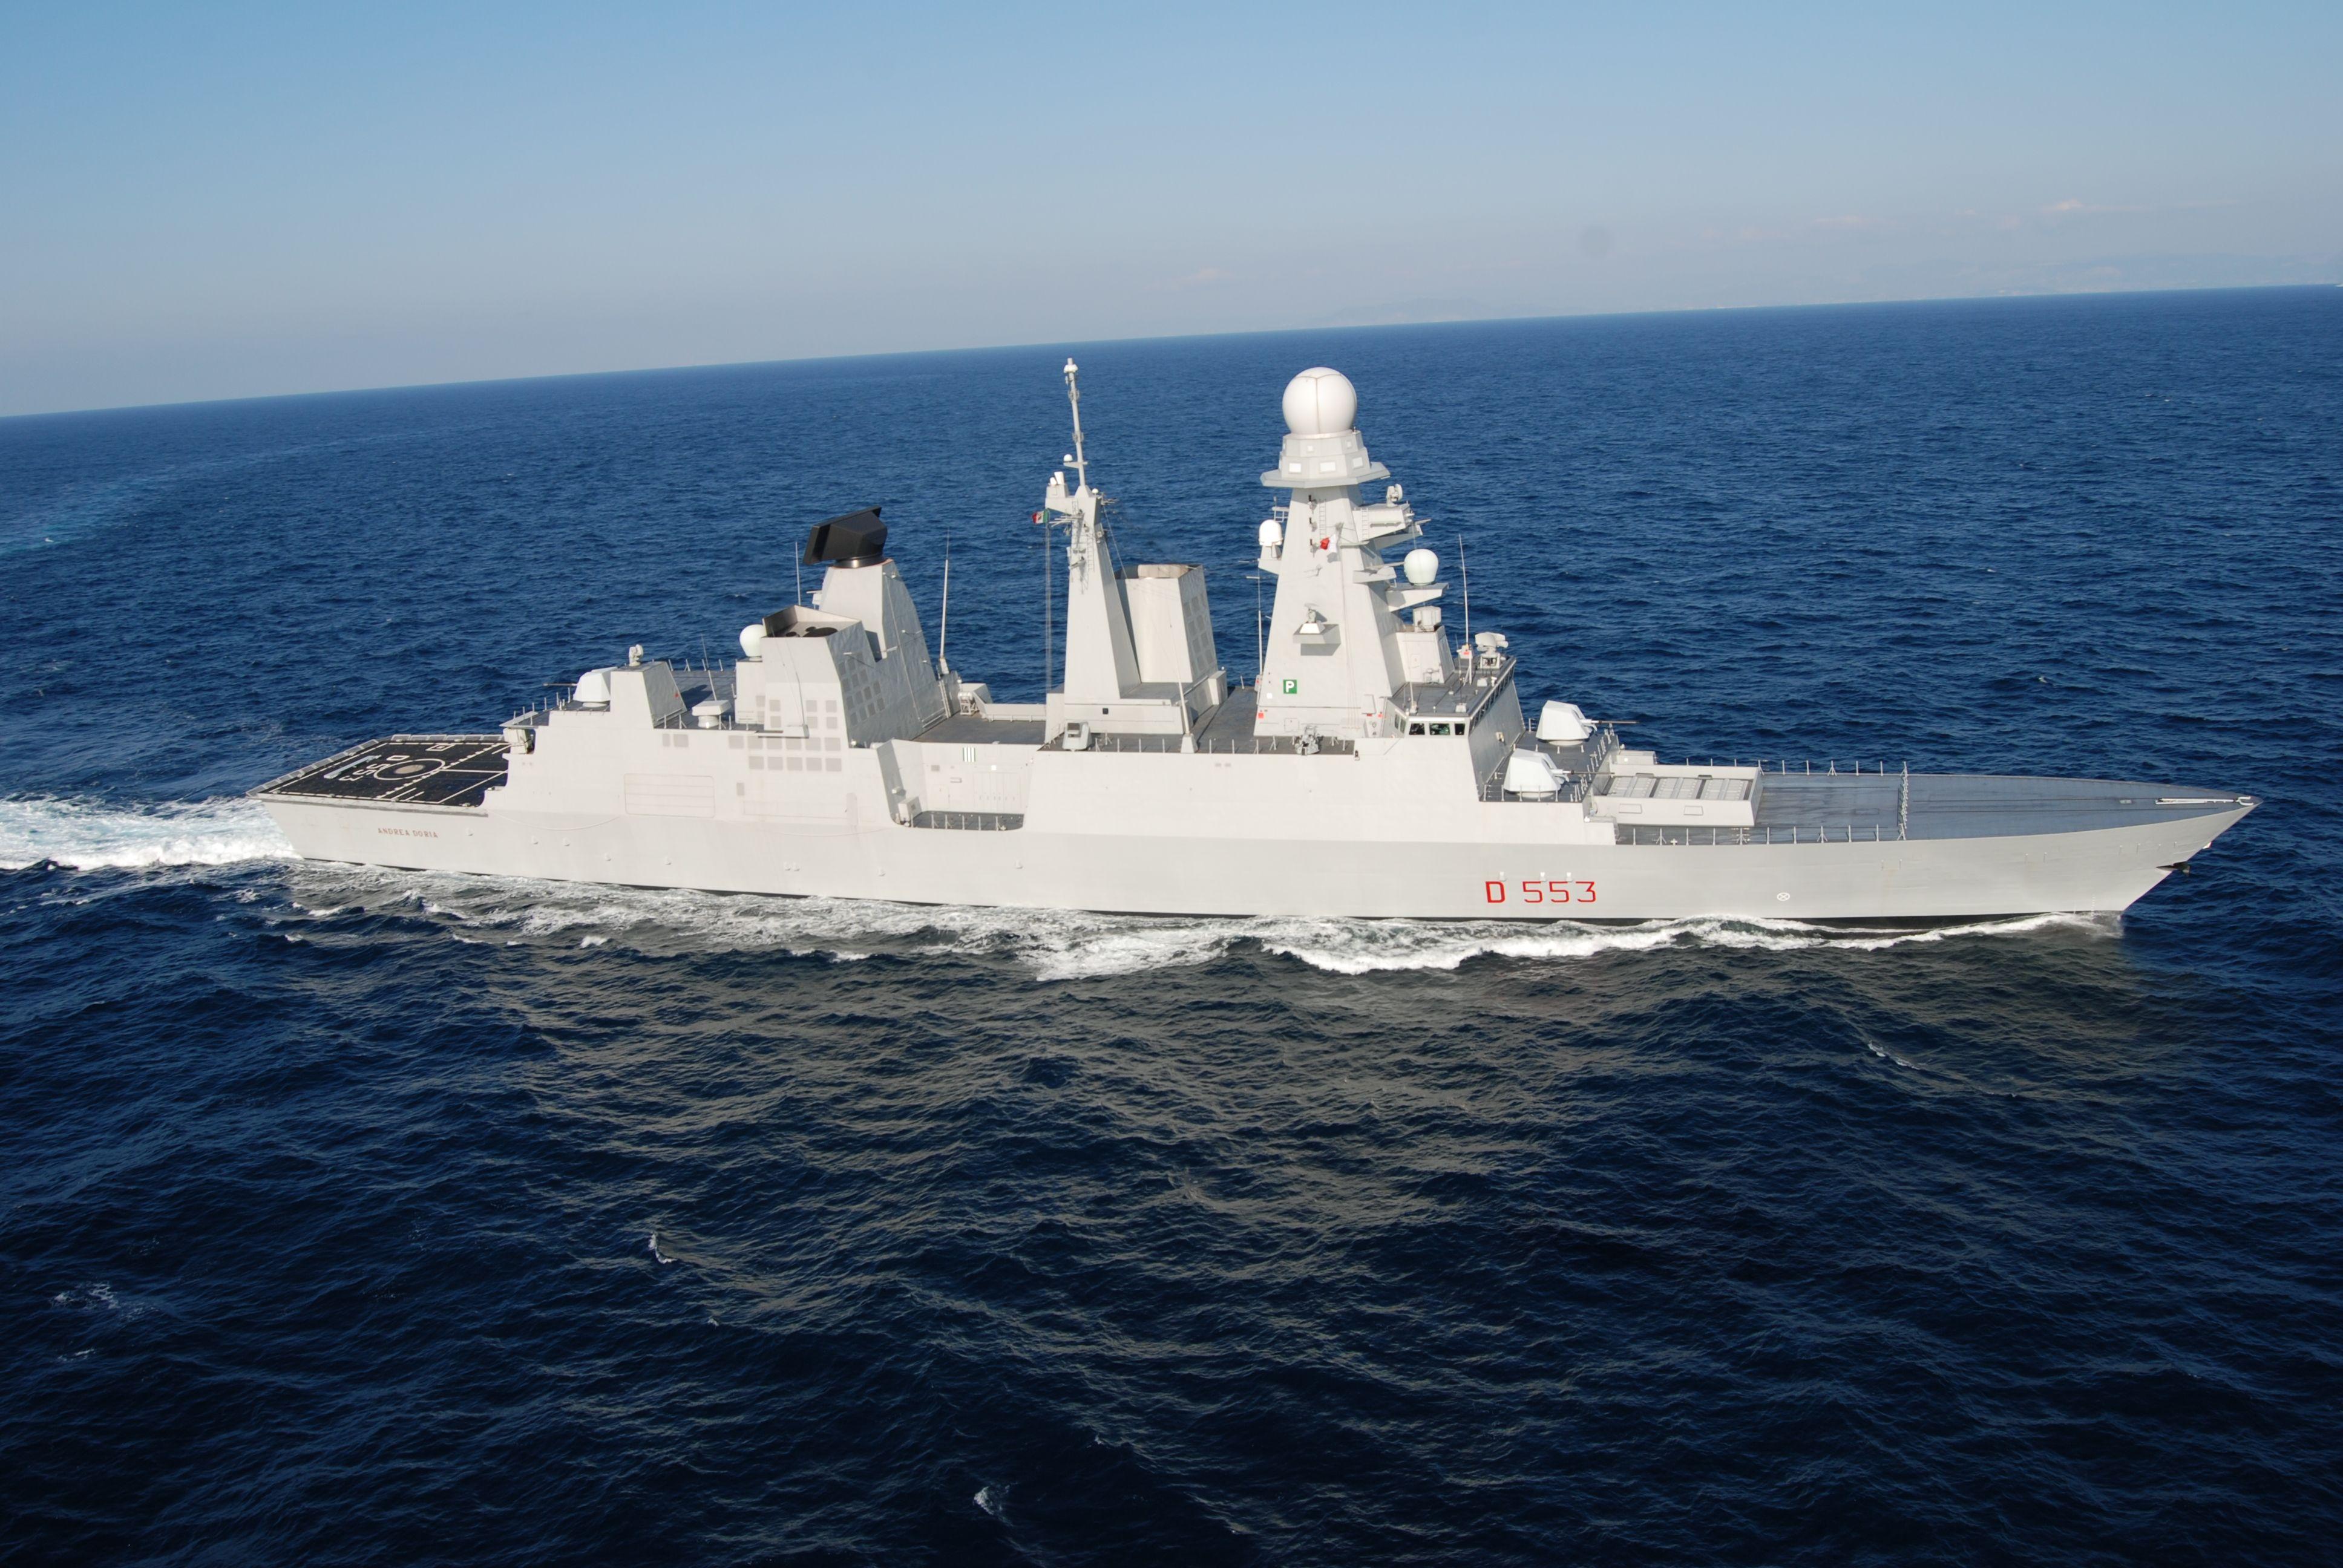 Destroyer Andrea Doria (D553) Marina Militare Italian